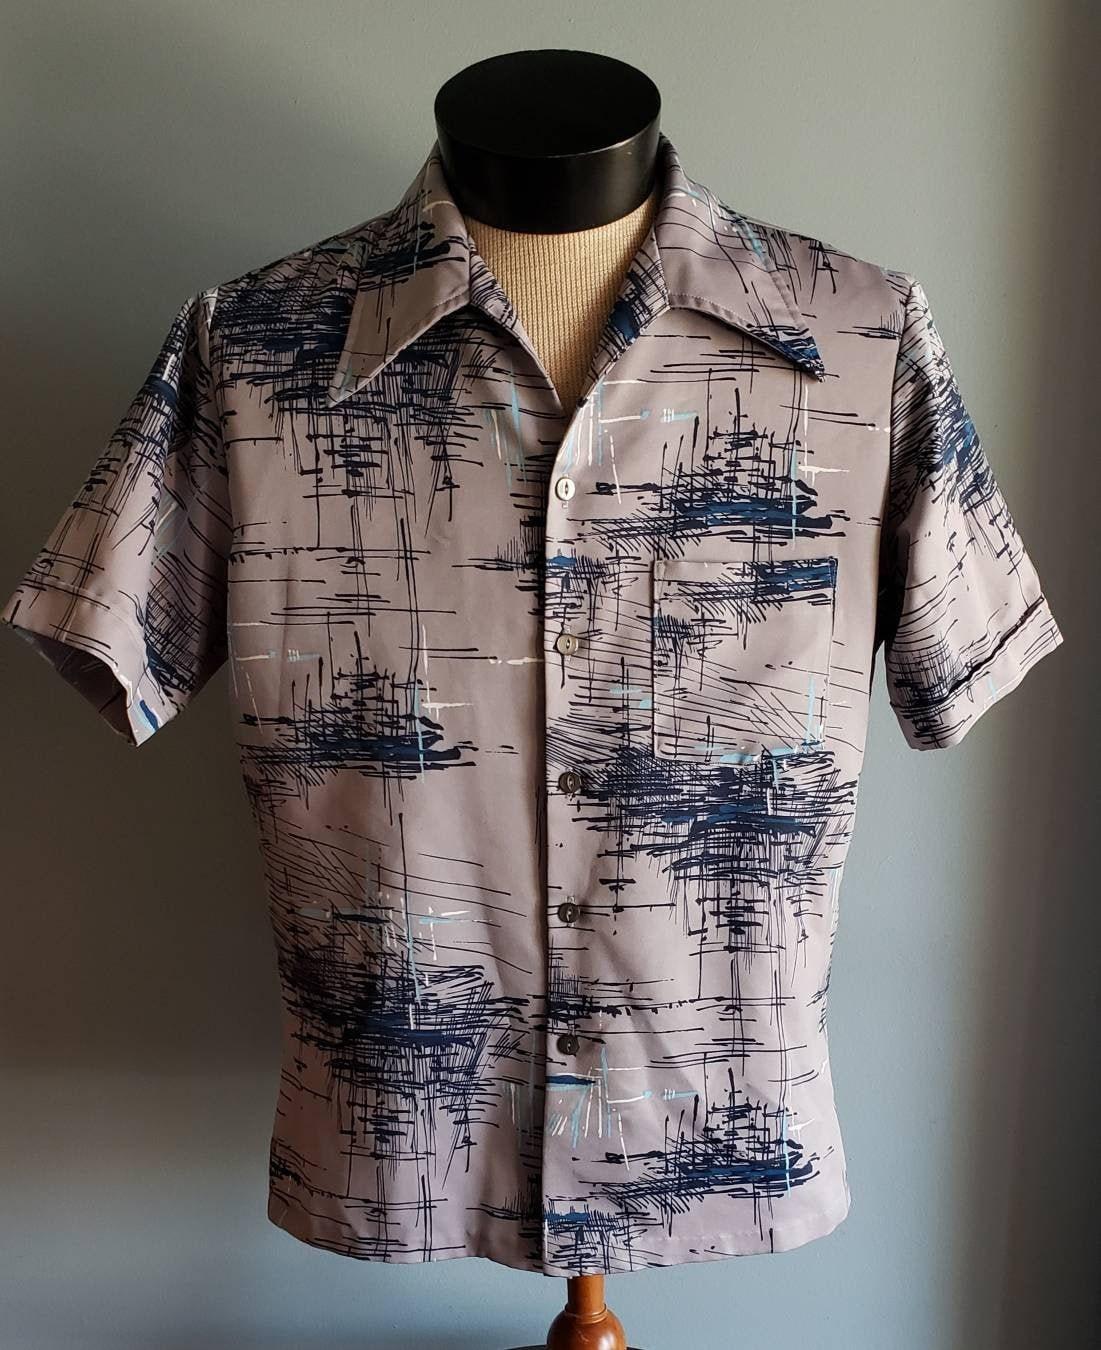 1970s Mens Shirt Styles – Vintage 70s Shirts for Guys Triumph Of California Mens Atomic Era Print Shirt $7.00 AT vintagedancer.com